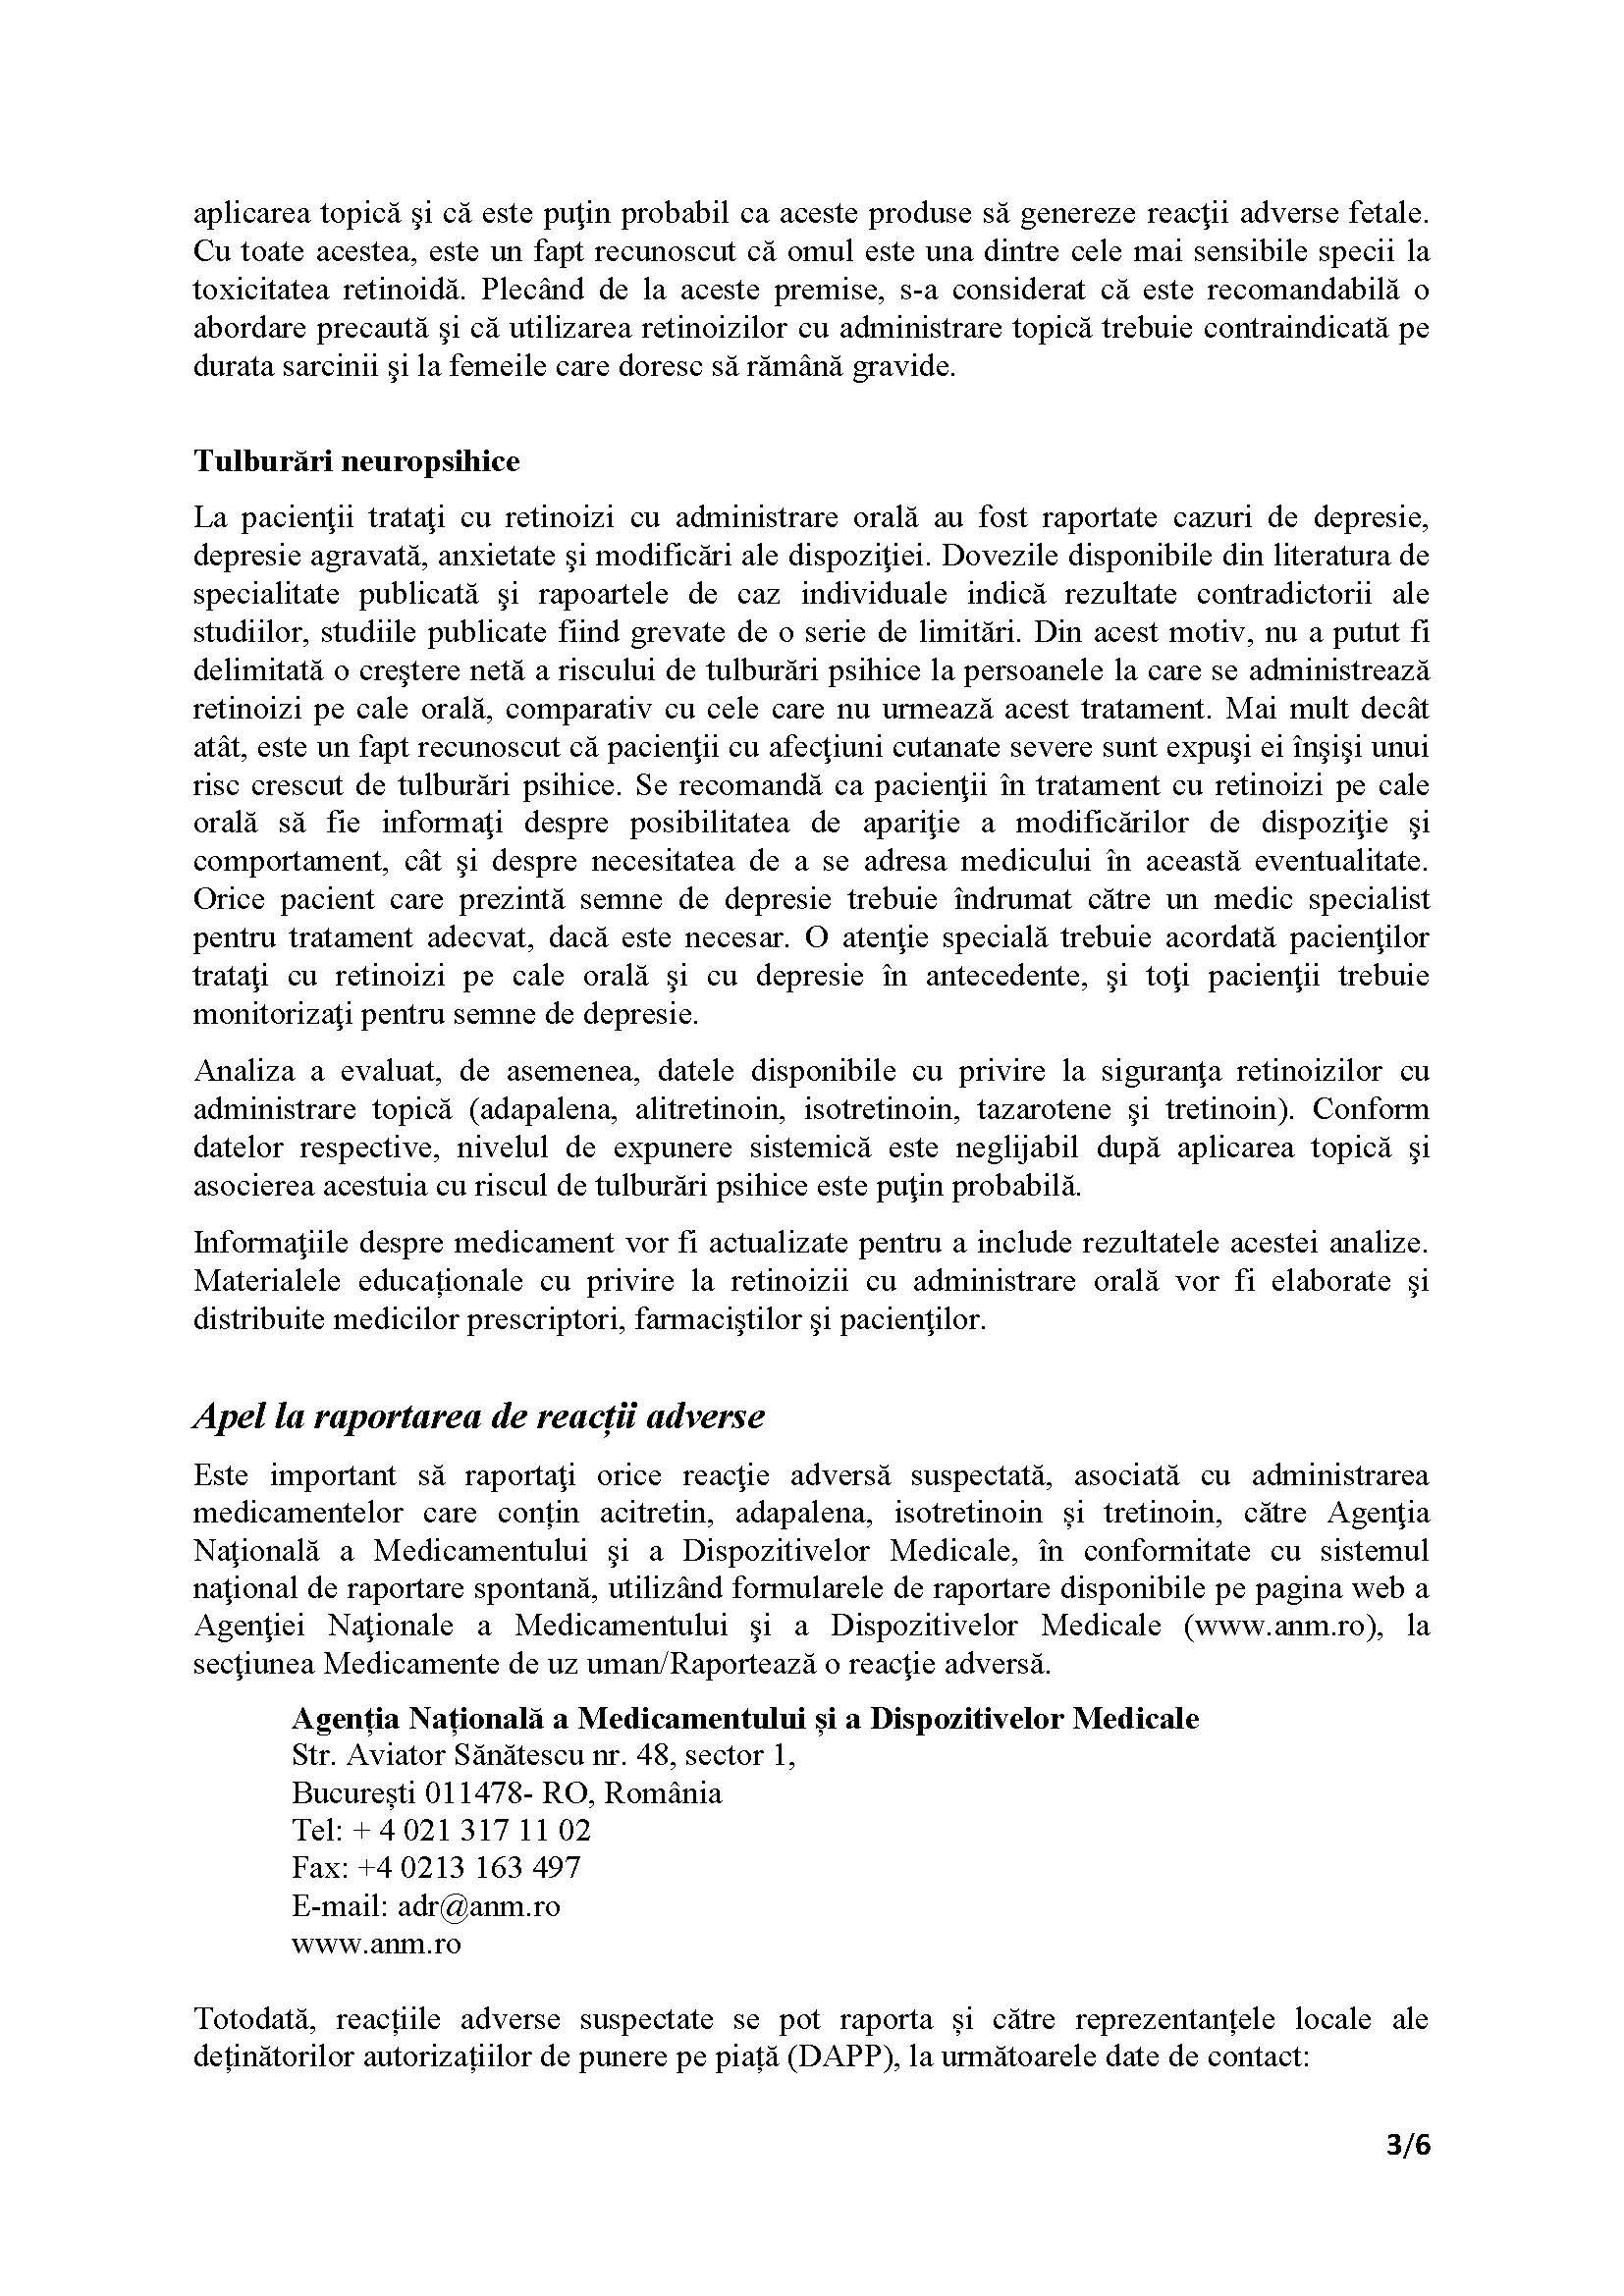 DHPC-Retinoizi_11.09.2018_Page_3